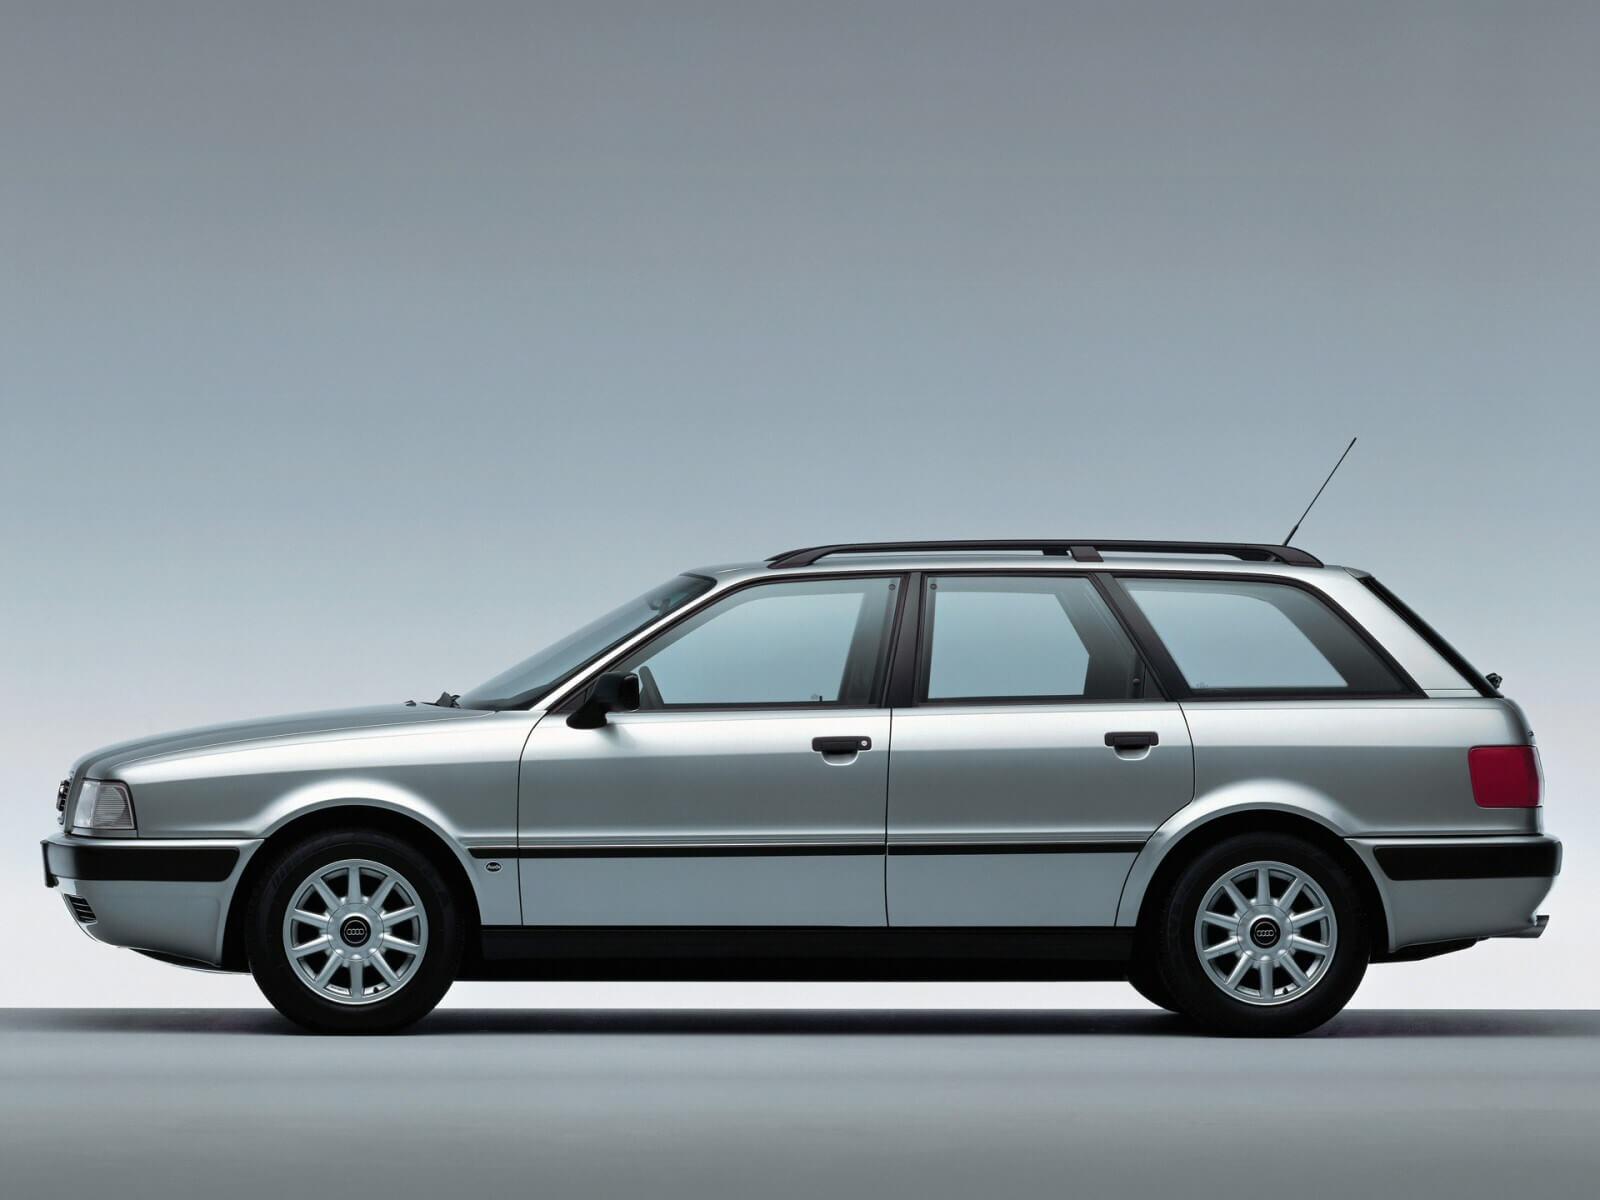 Kekurangan Audi A80 Tangguh